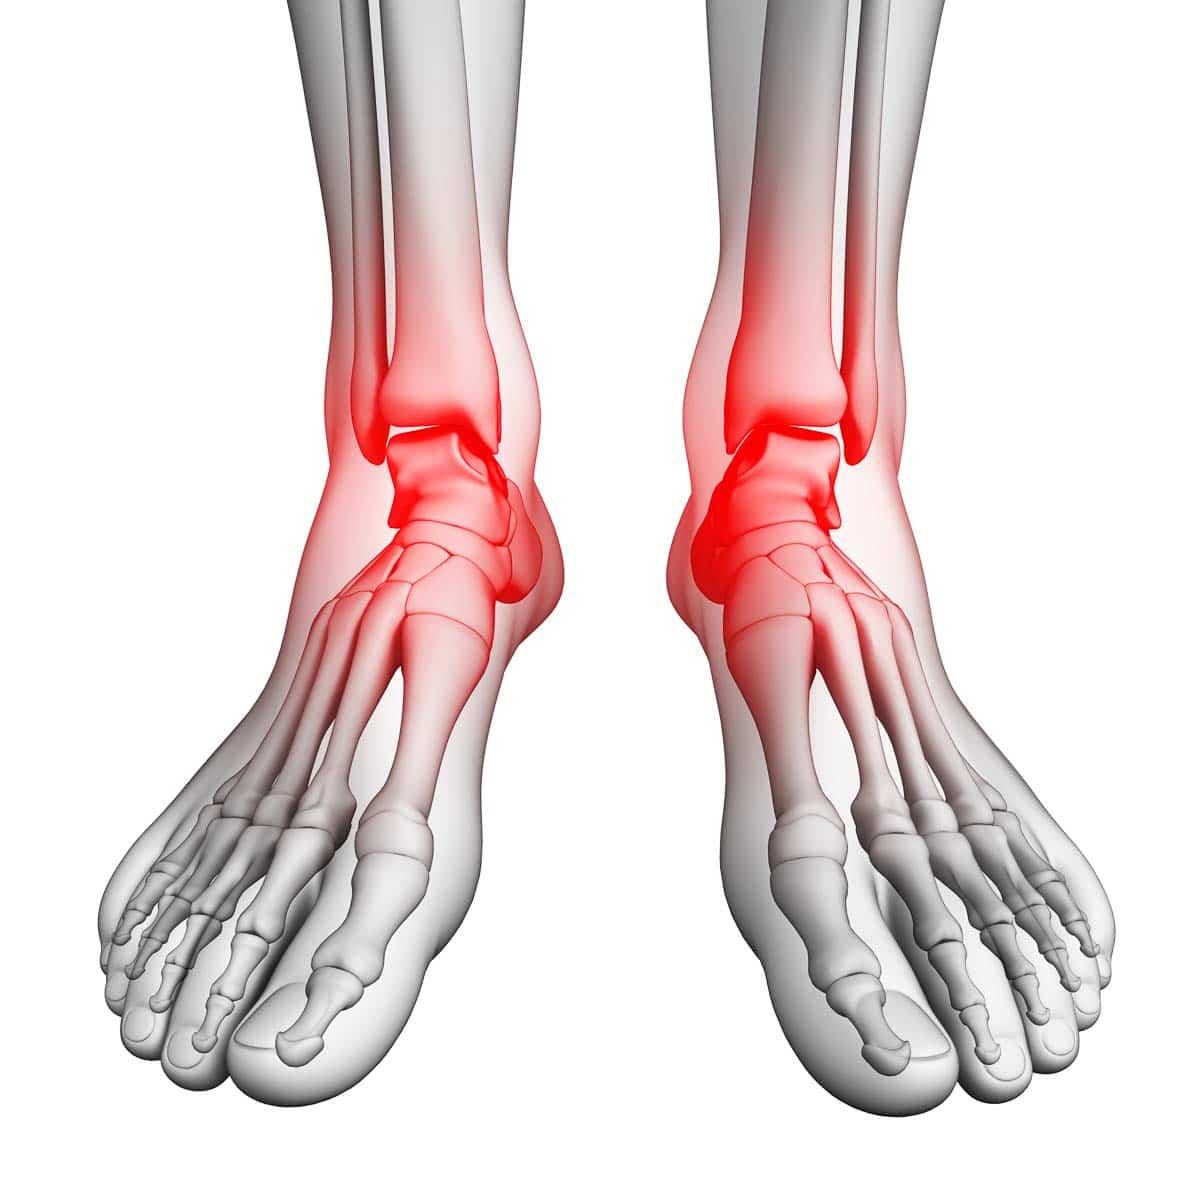 Darstellung Füße - Sprunggelenksarthrose